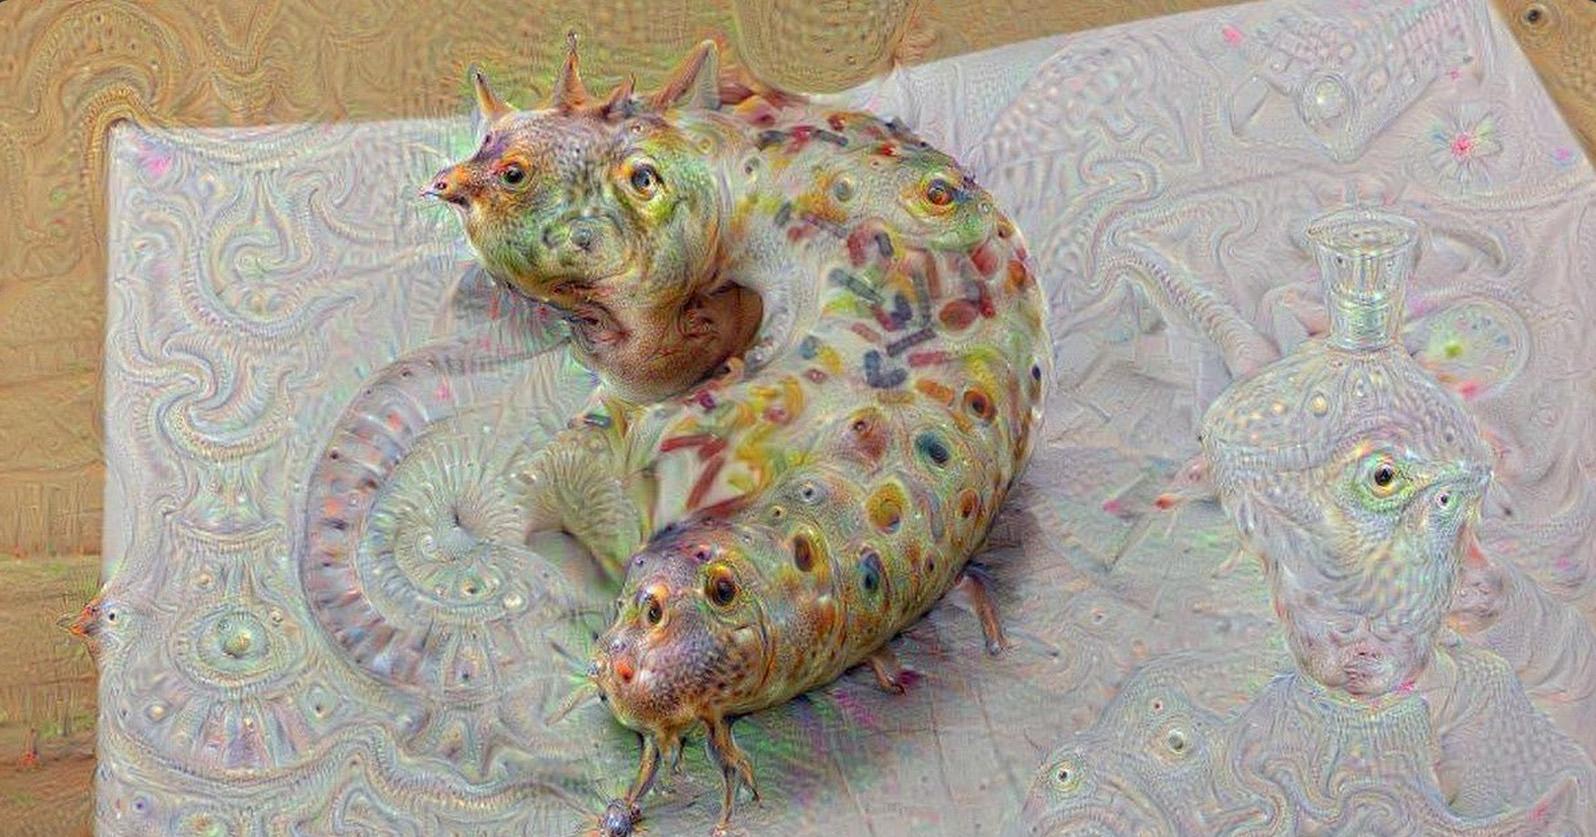 A half-eaten donut becomes a slug